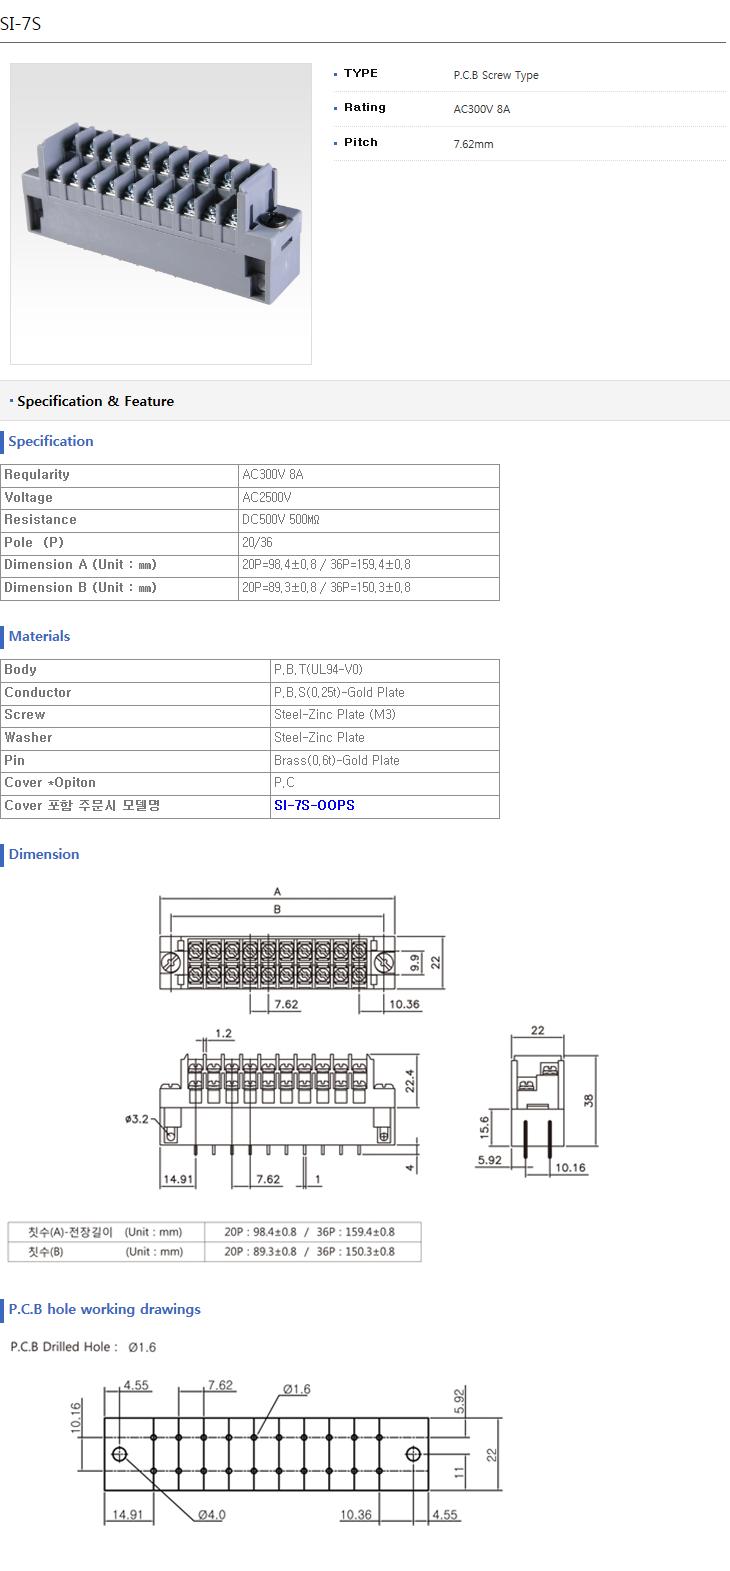 Seoil Electronics P.C.B Screw Type SI-7S